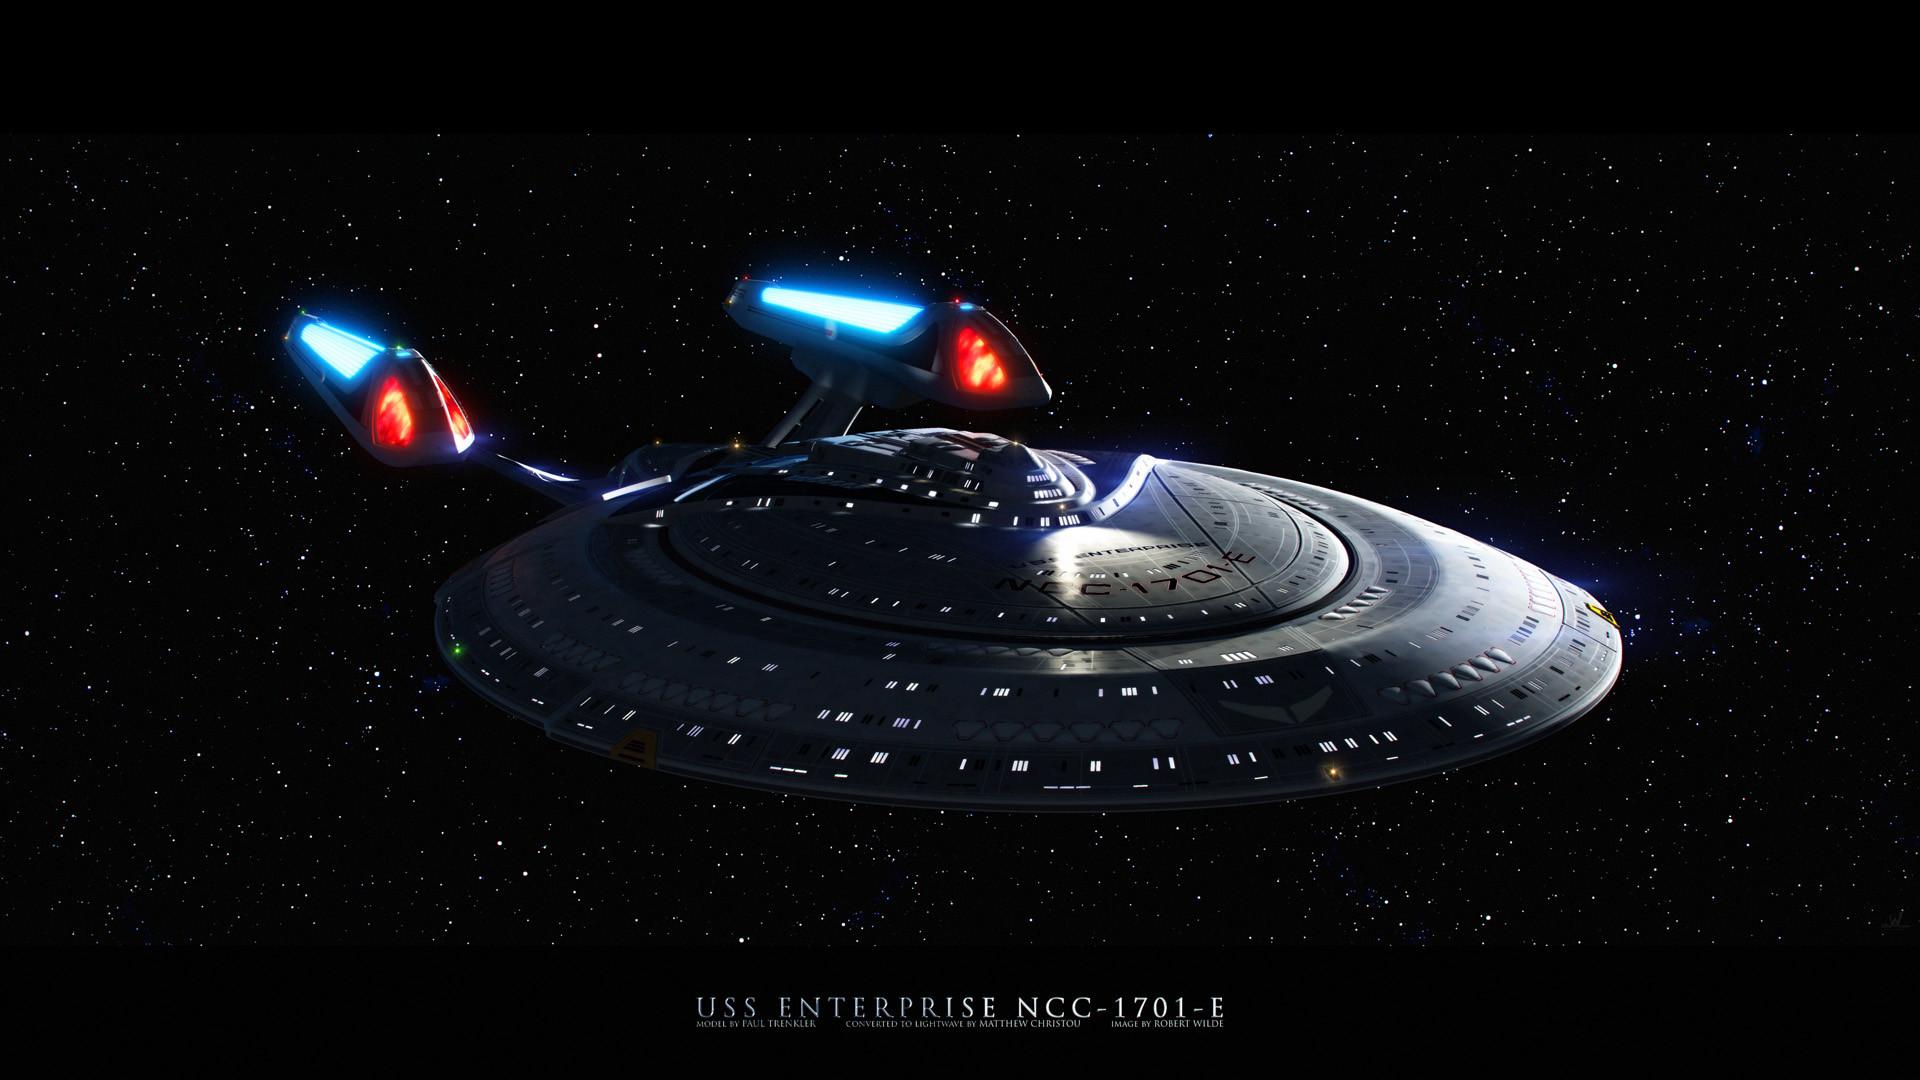 Star Trek 0 HTML code. wallpaper space enterprise wallpapers 1920×1080